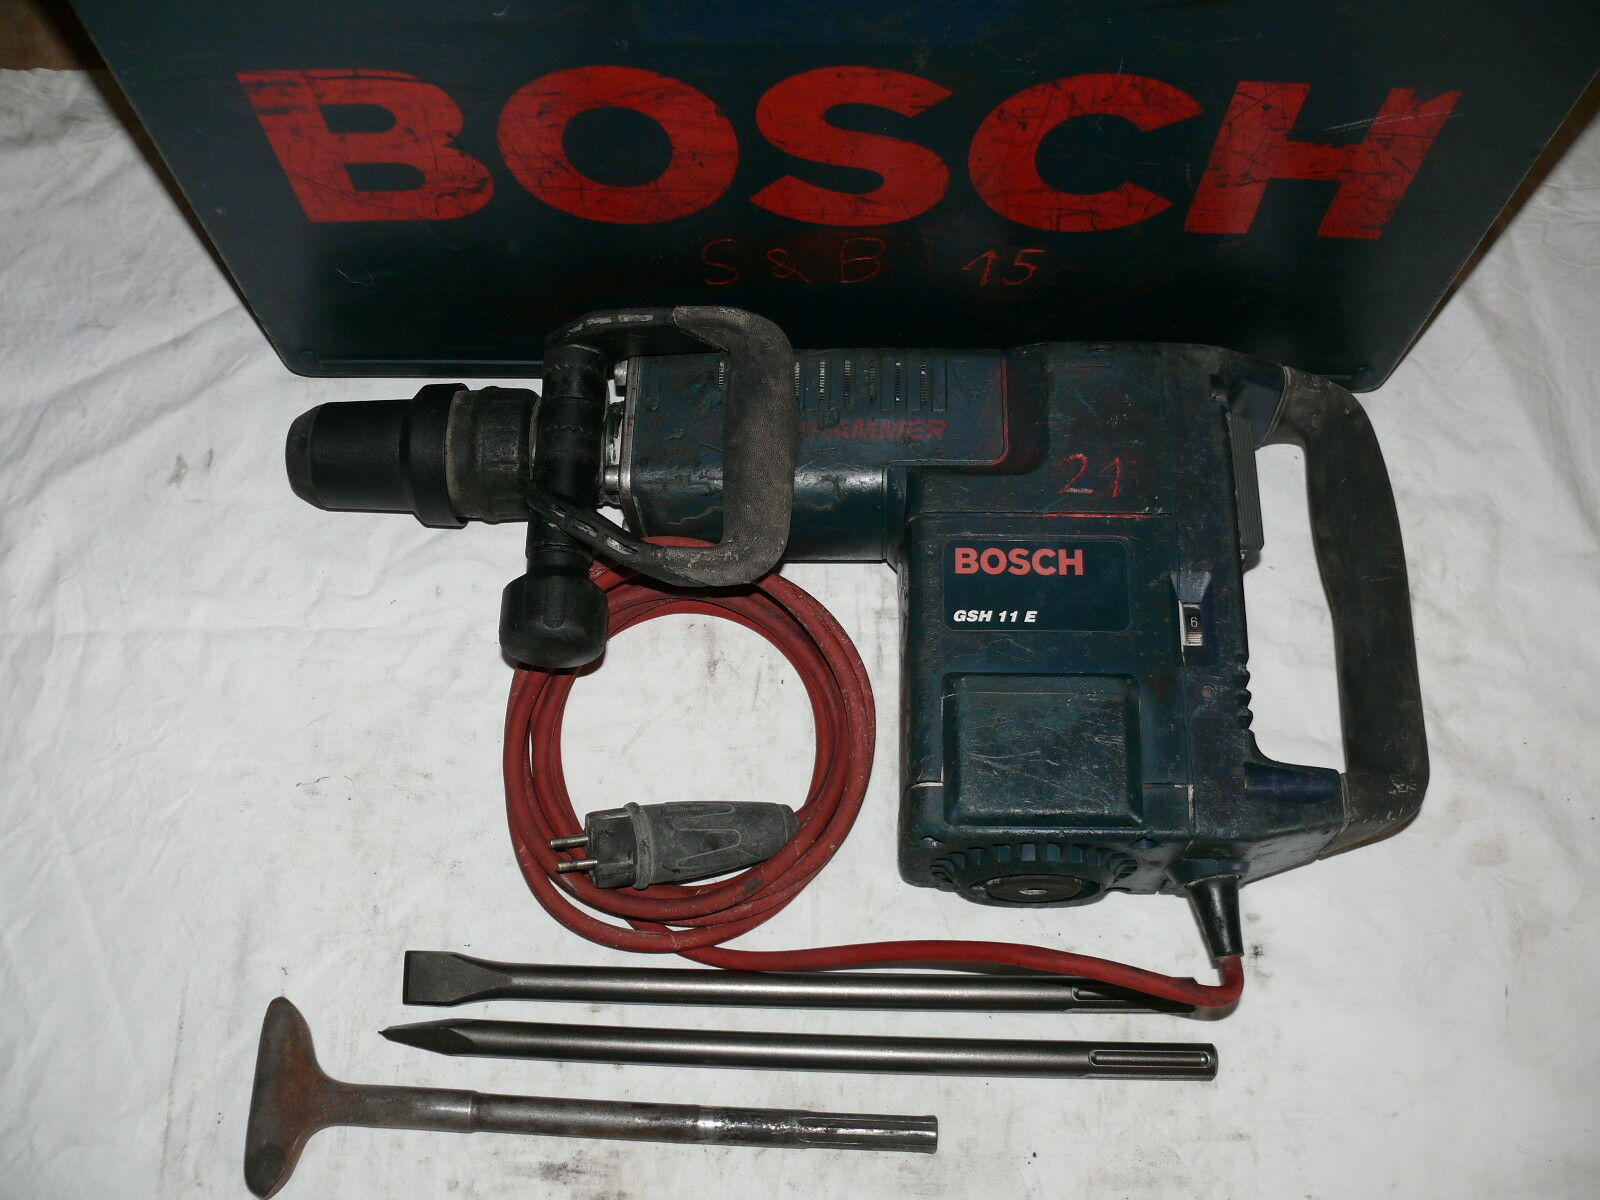 Bosch GSH 11 E MEISSELHAMMER STEMMHAMMER SCHLAGHAMMER ABBRUCHHAMMER BOSCHHAMMER